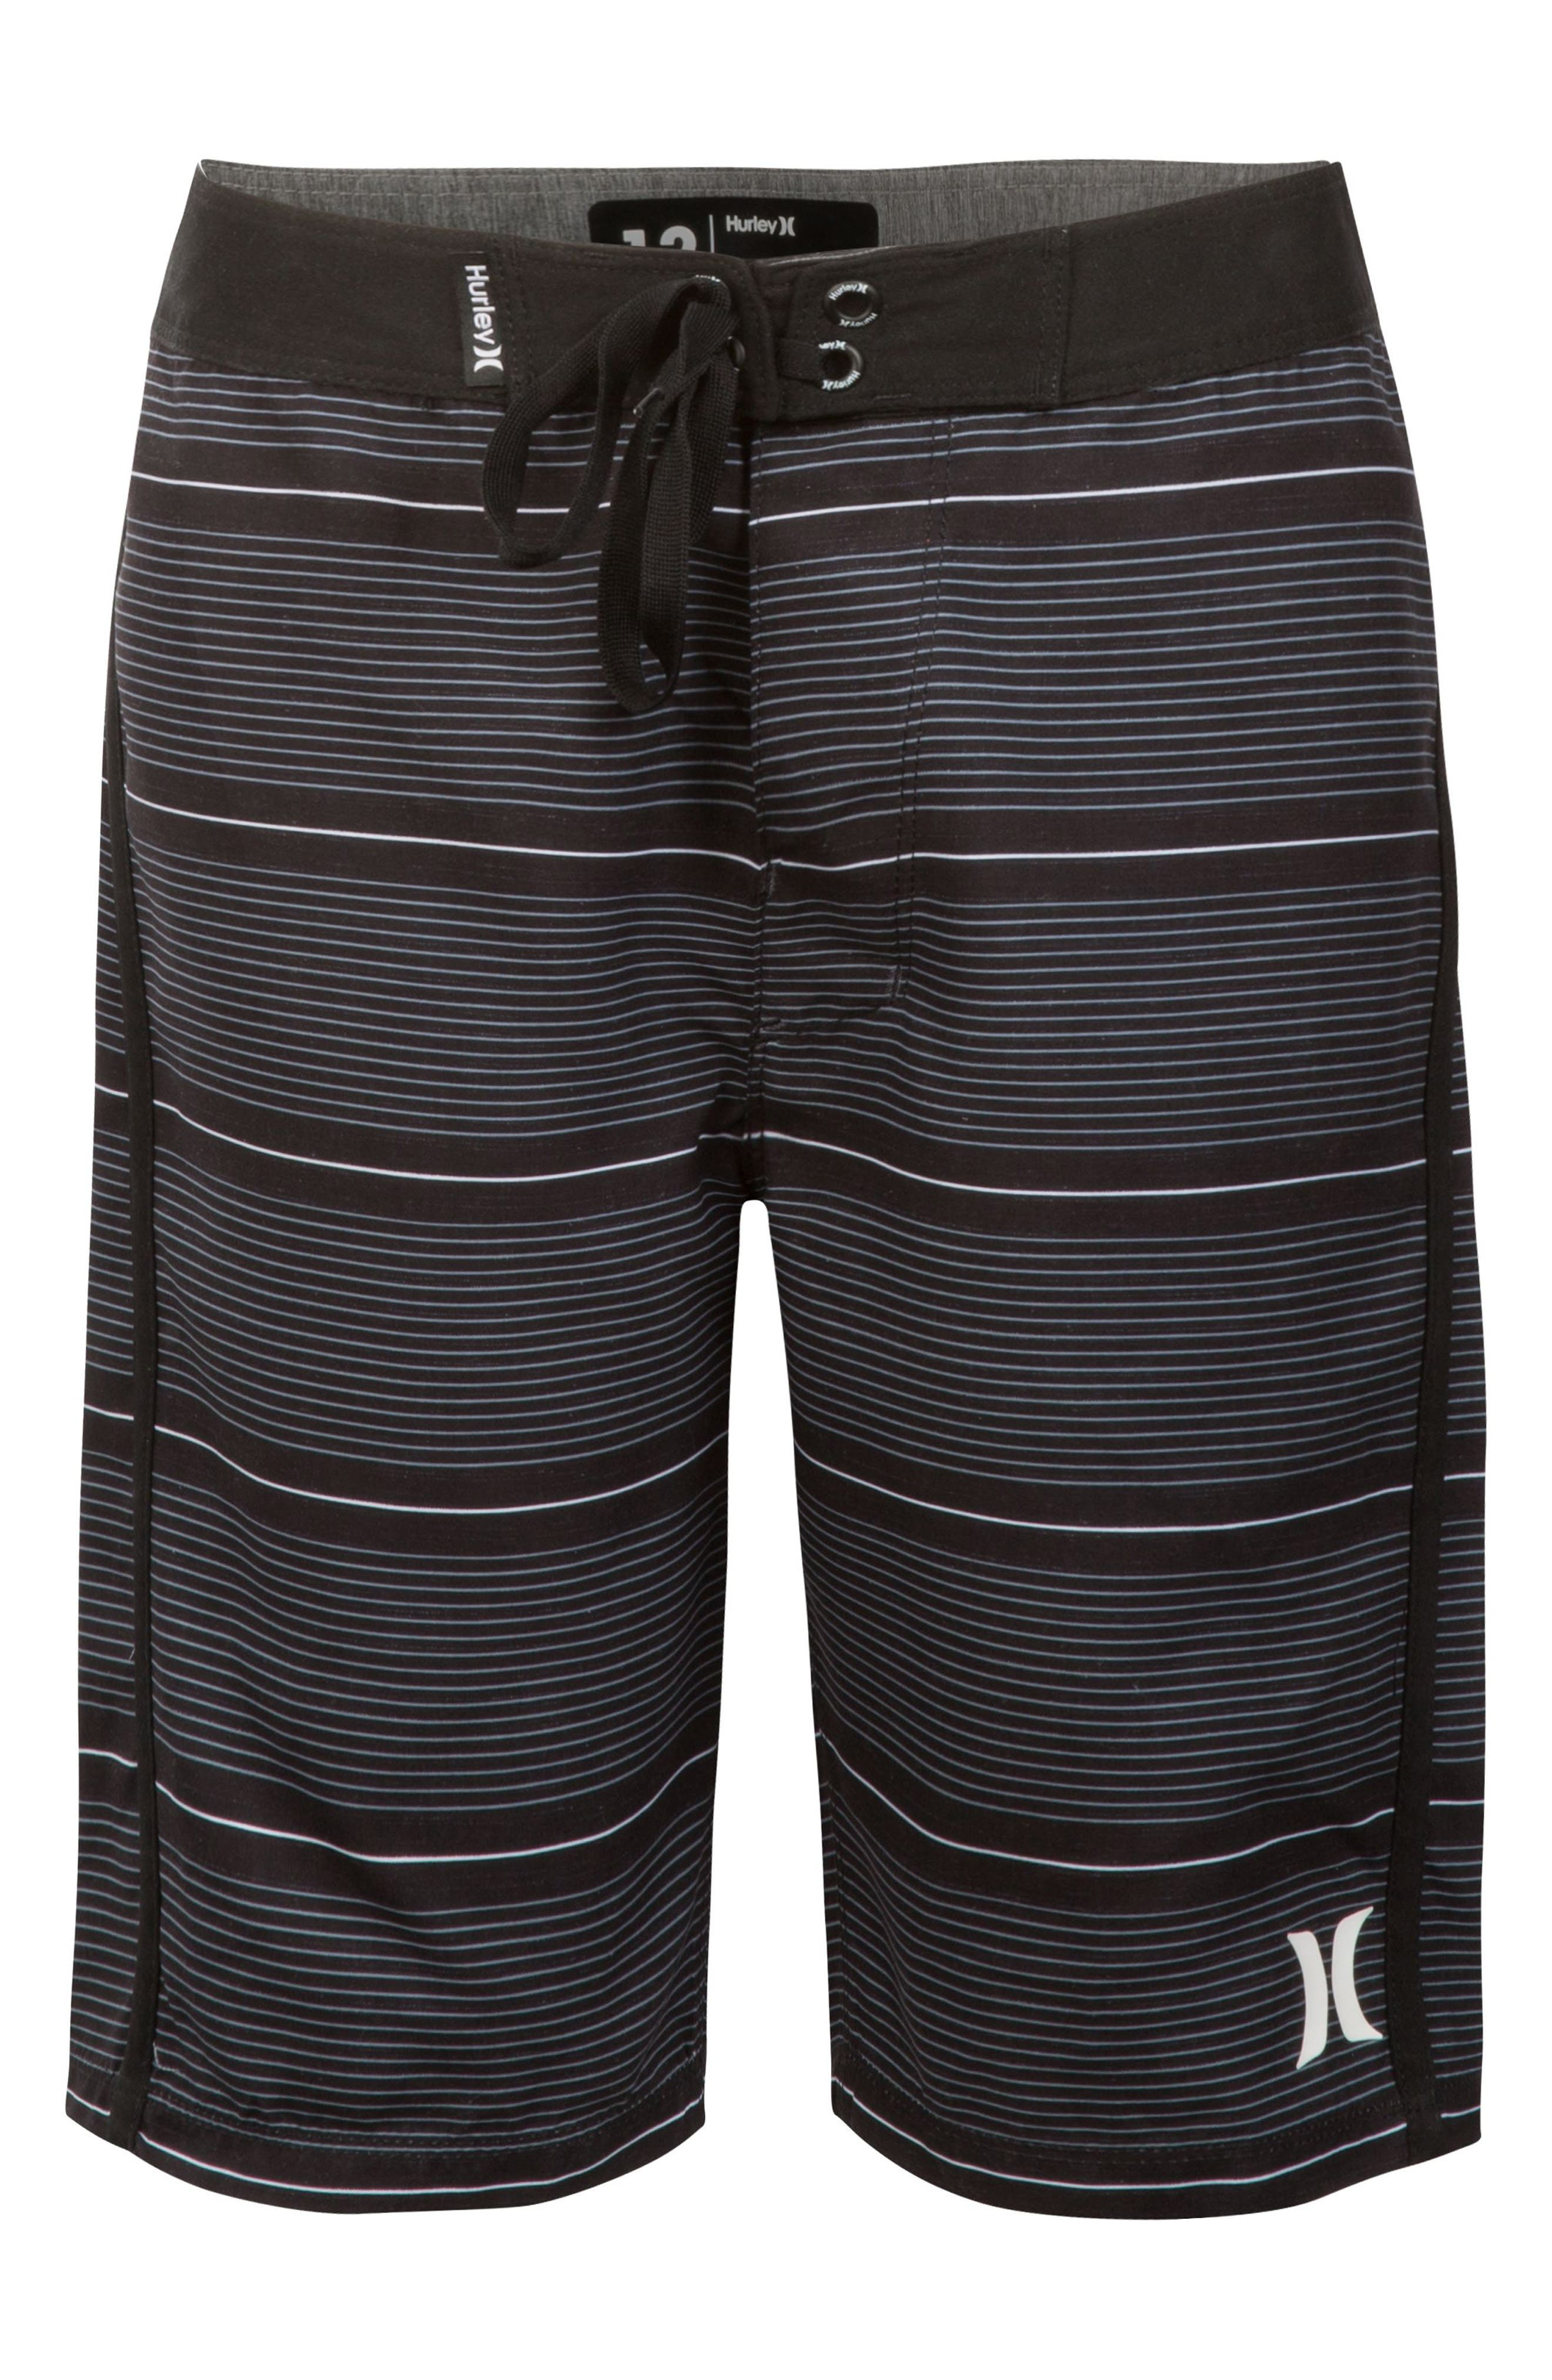 Shoreline Board Shorts,                             Main thumbnail 1, color,                             001